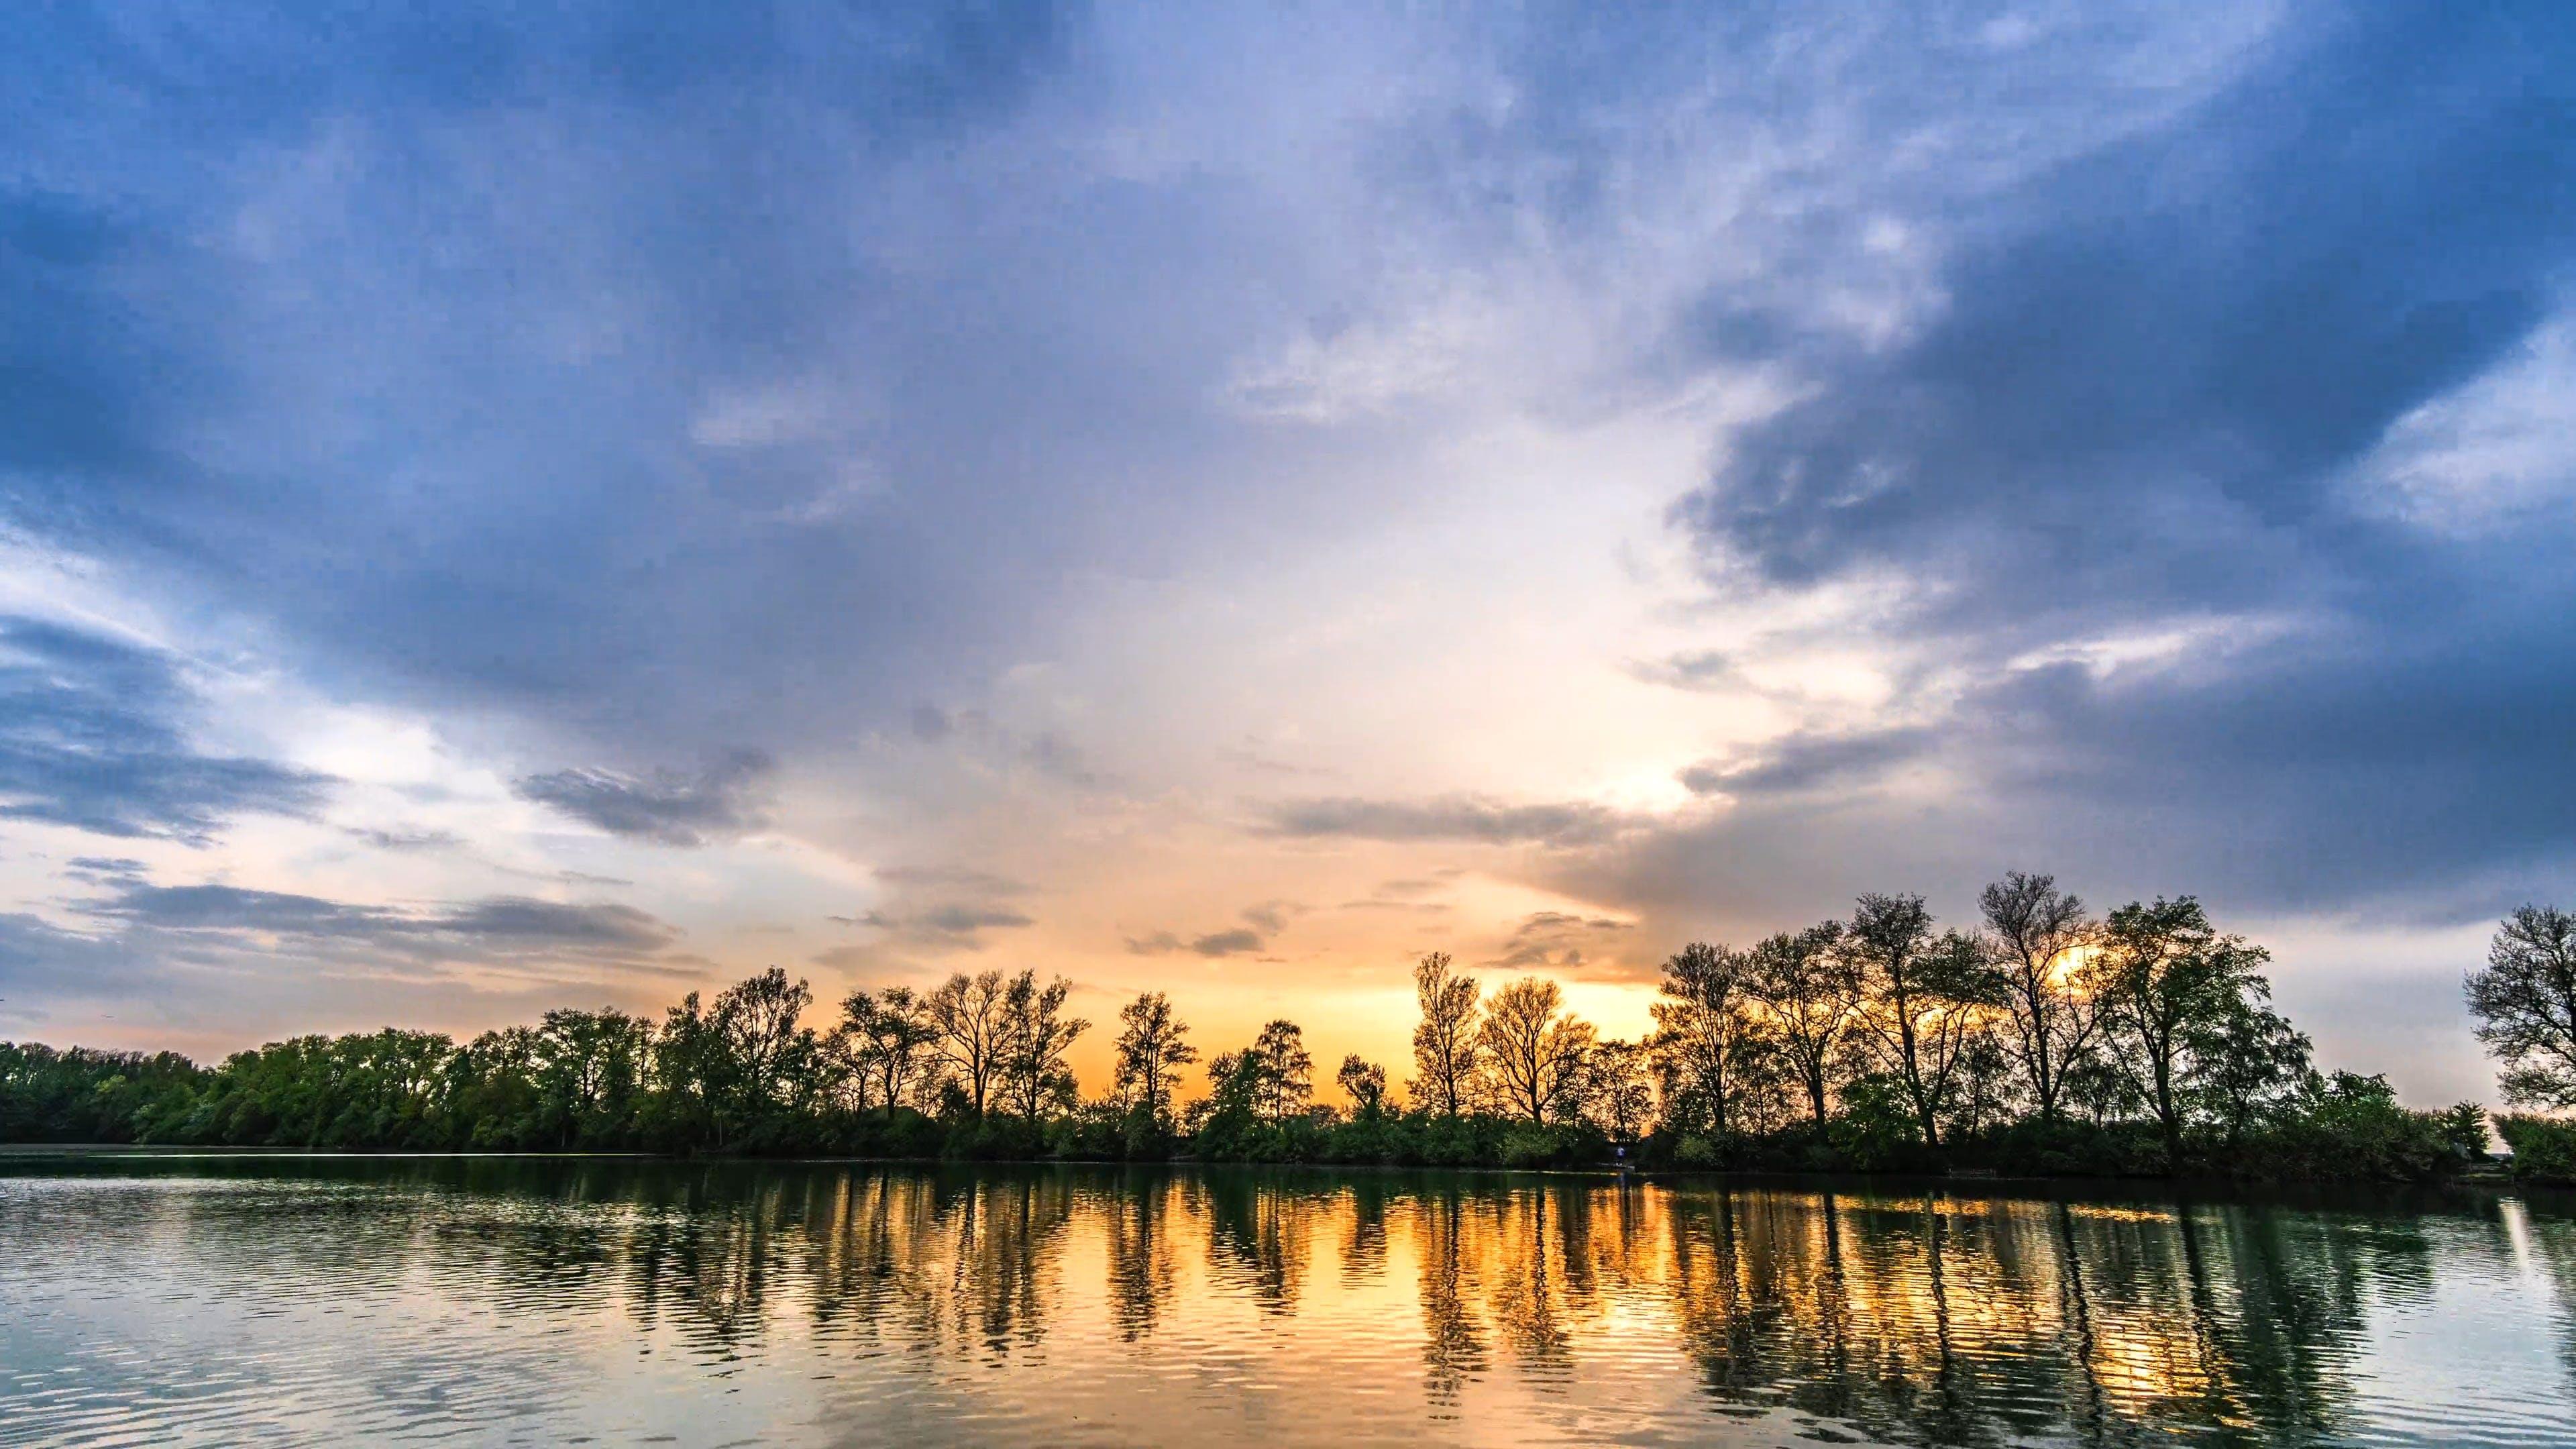 Beautiful Time Lapse Of Sunset